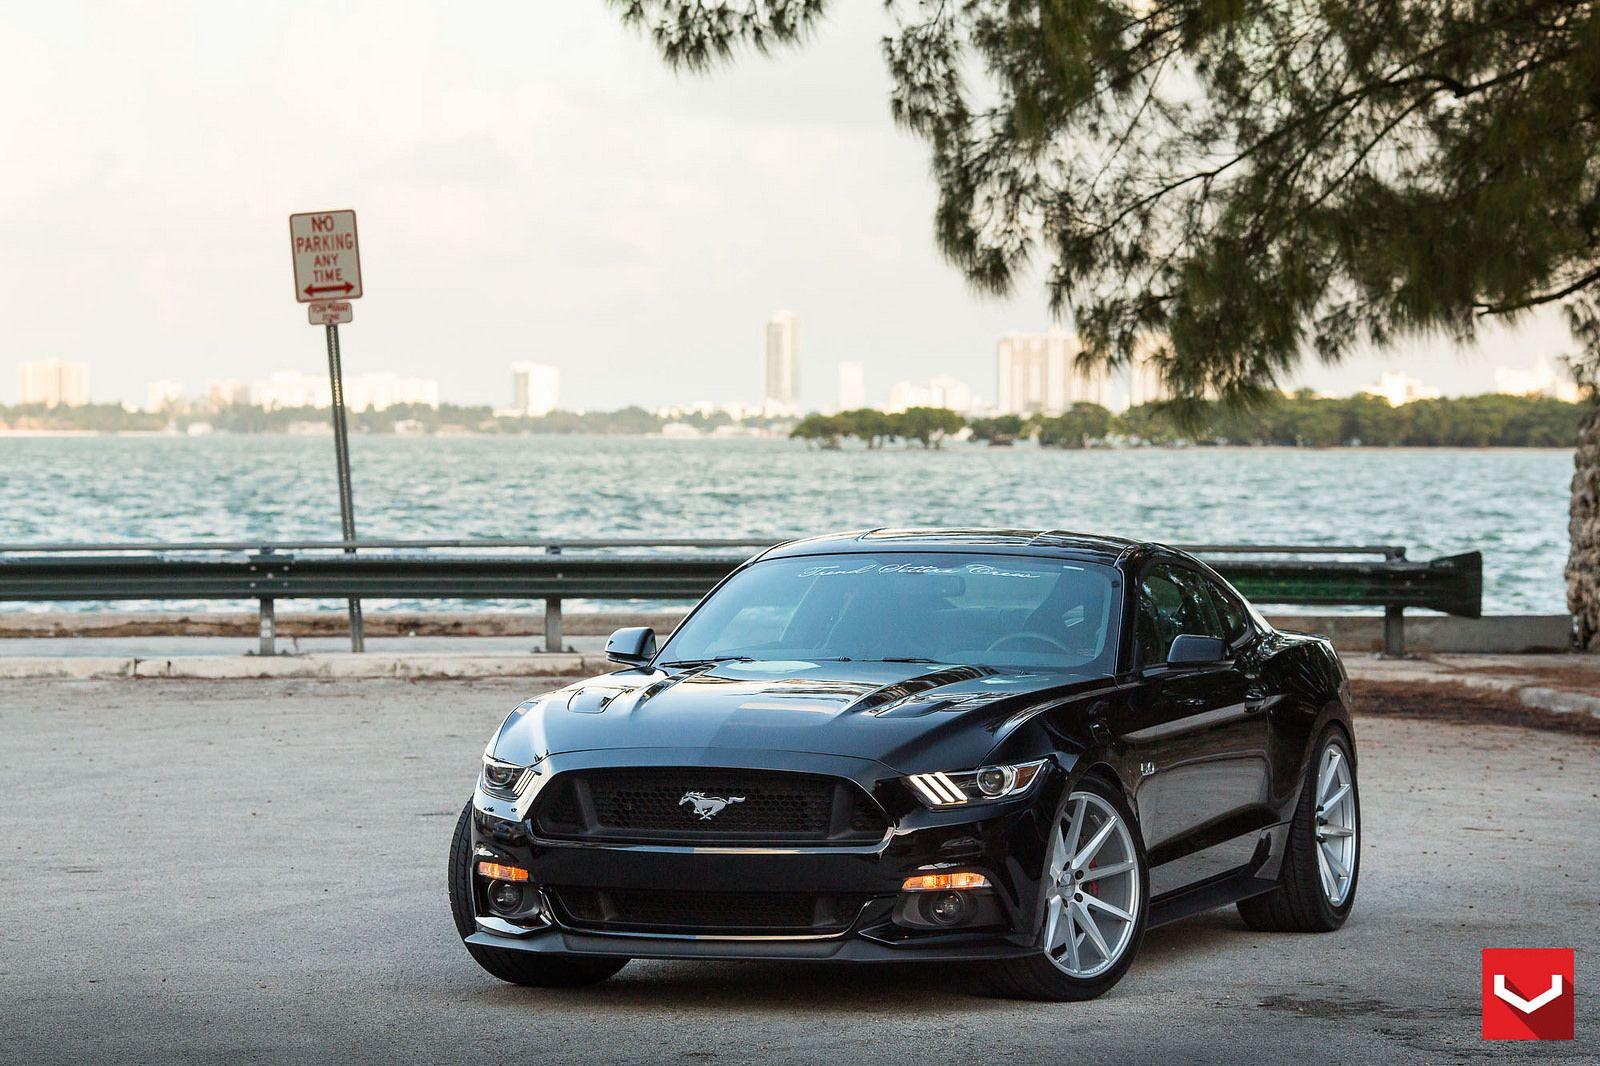 Ford mustang gt 5 0 s550 vfs1 vossen wheels 2014